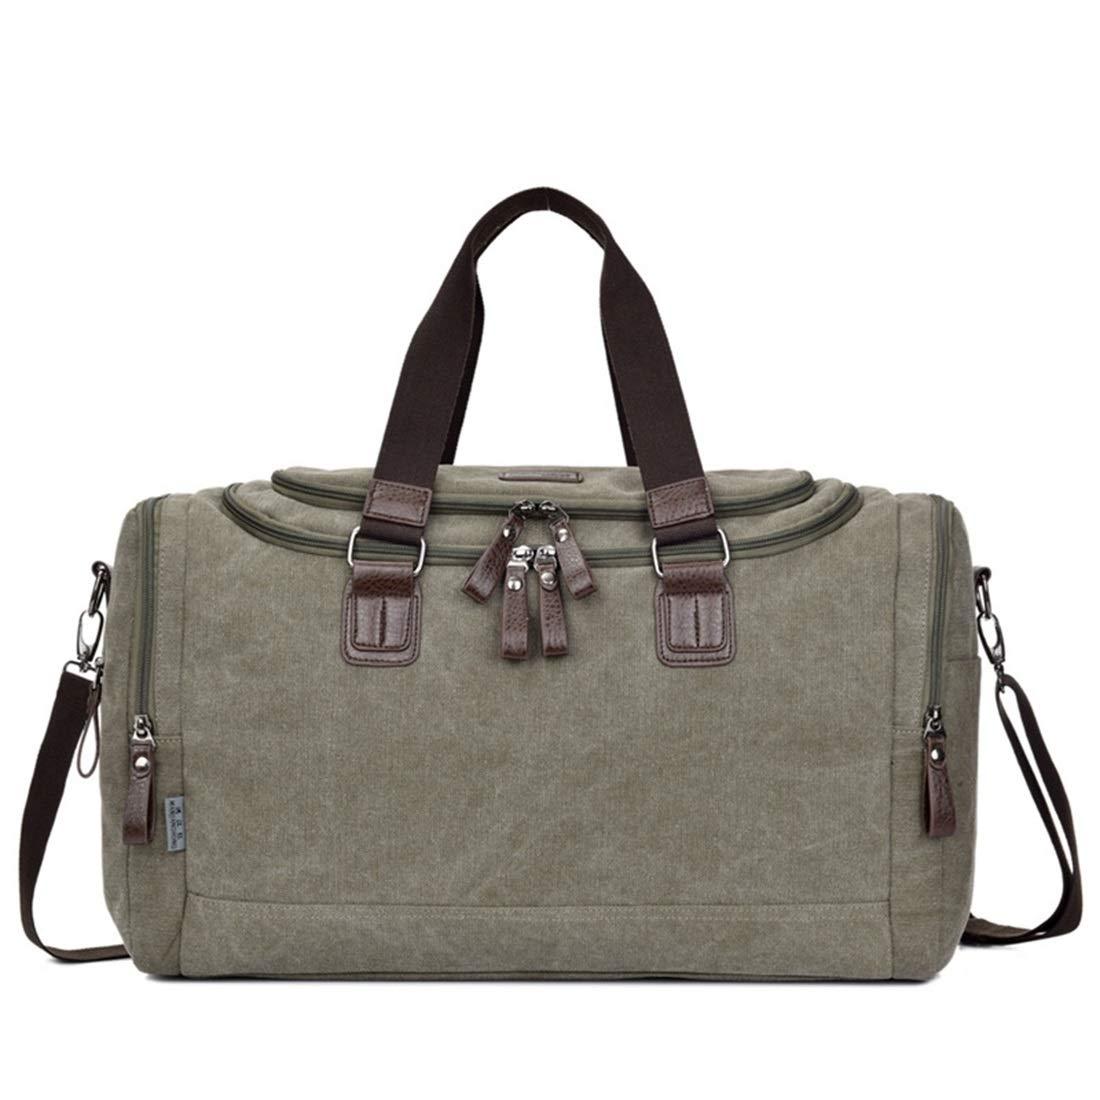 Carriemeow Canvas Bag Hand Bag Business Casual Canvas Large Single Shoulder Bag Travel Luggage Bag Fashion Satchel Color : Green